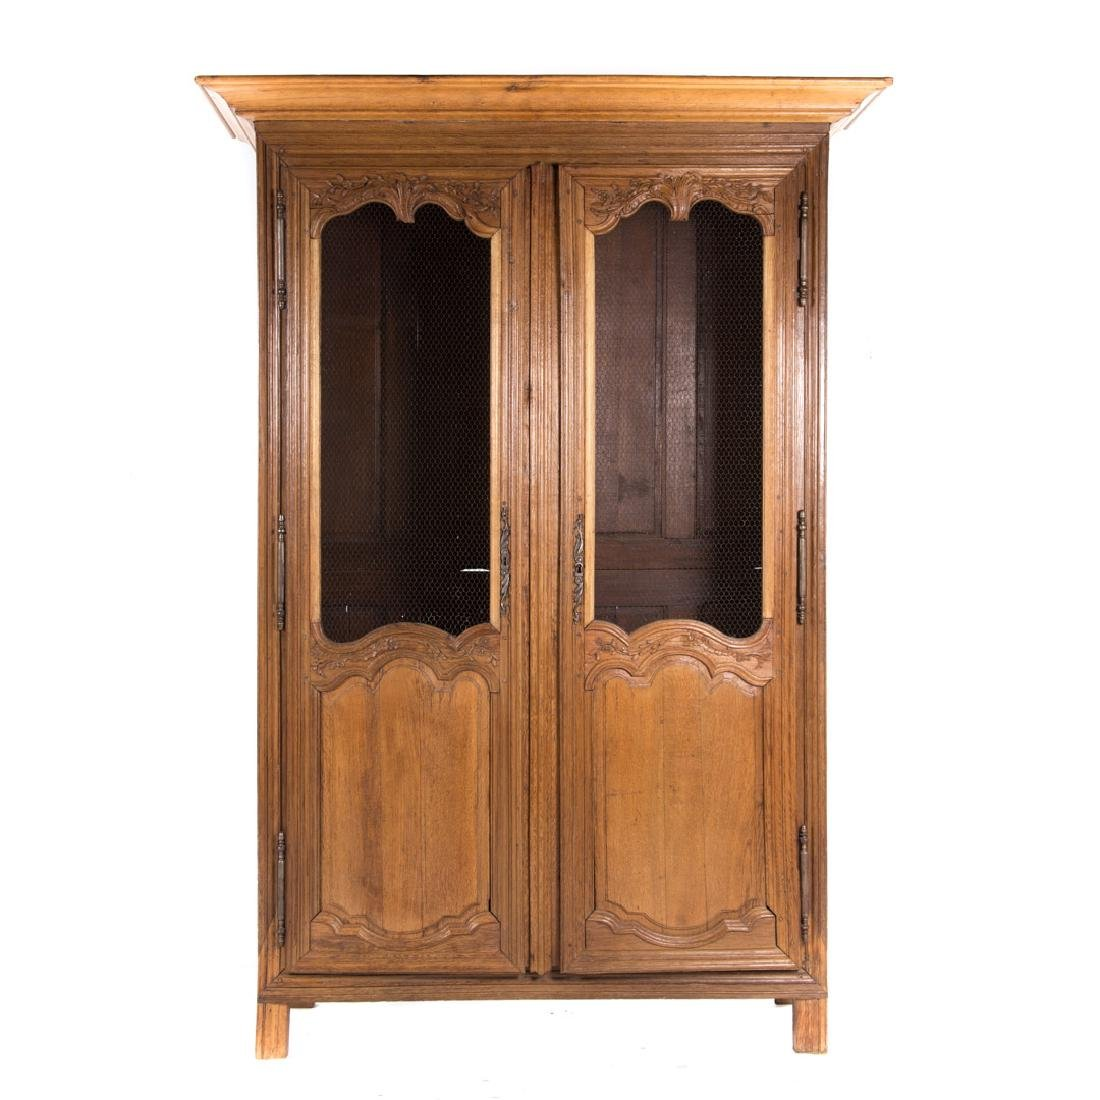 Louis XVI style oak bibliotheque